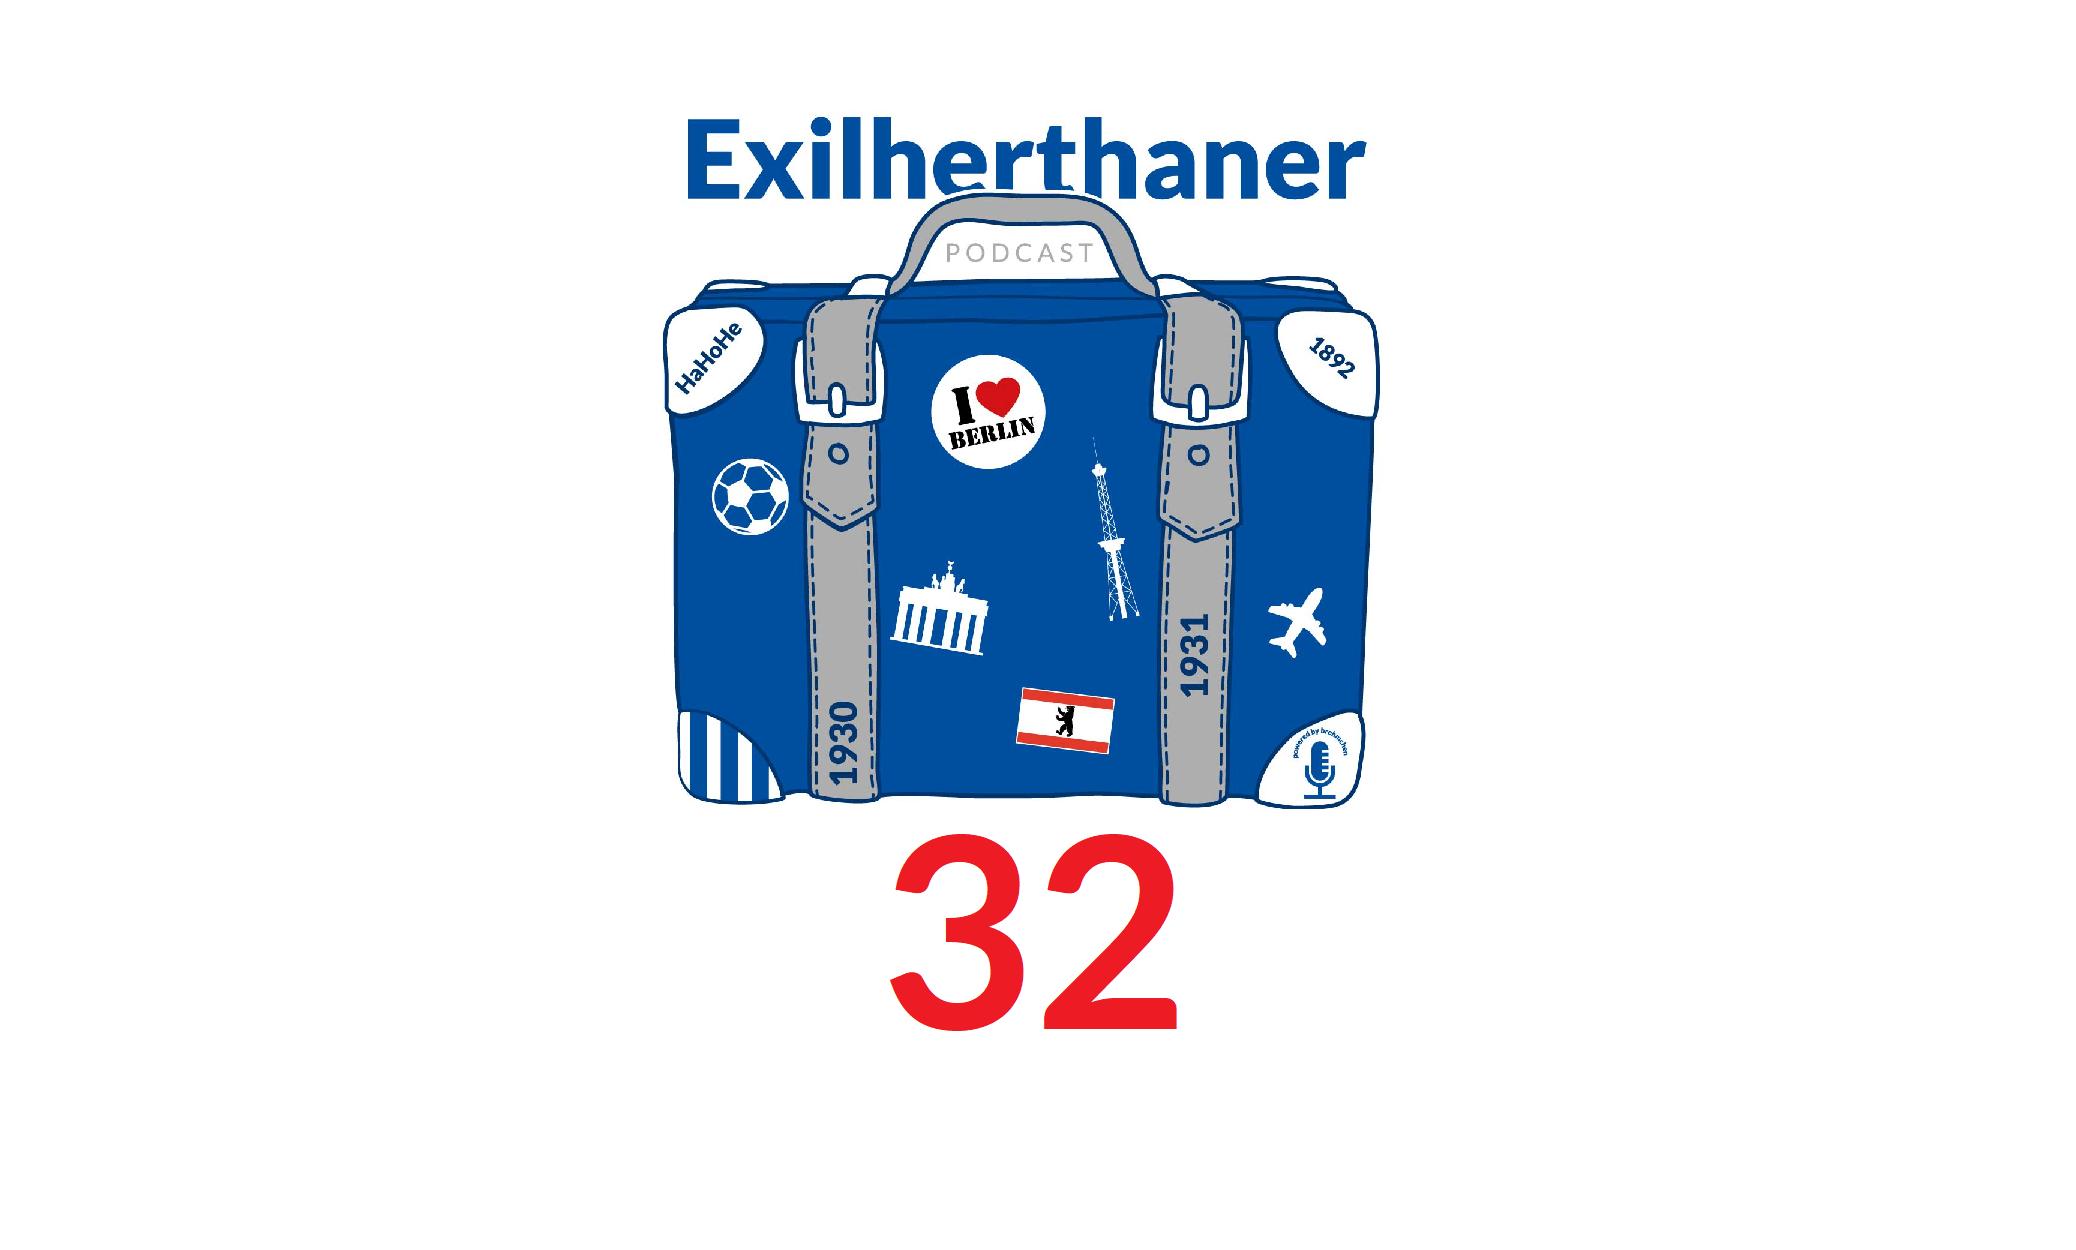 Bayern 1 Gästeliste